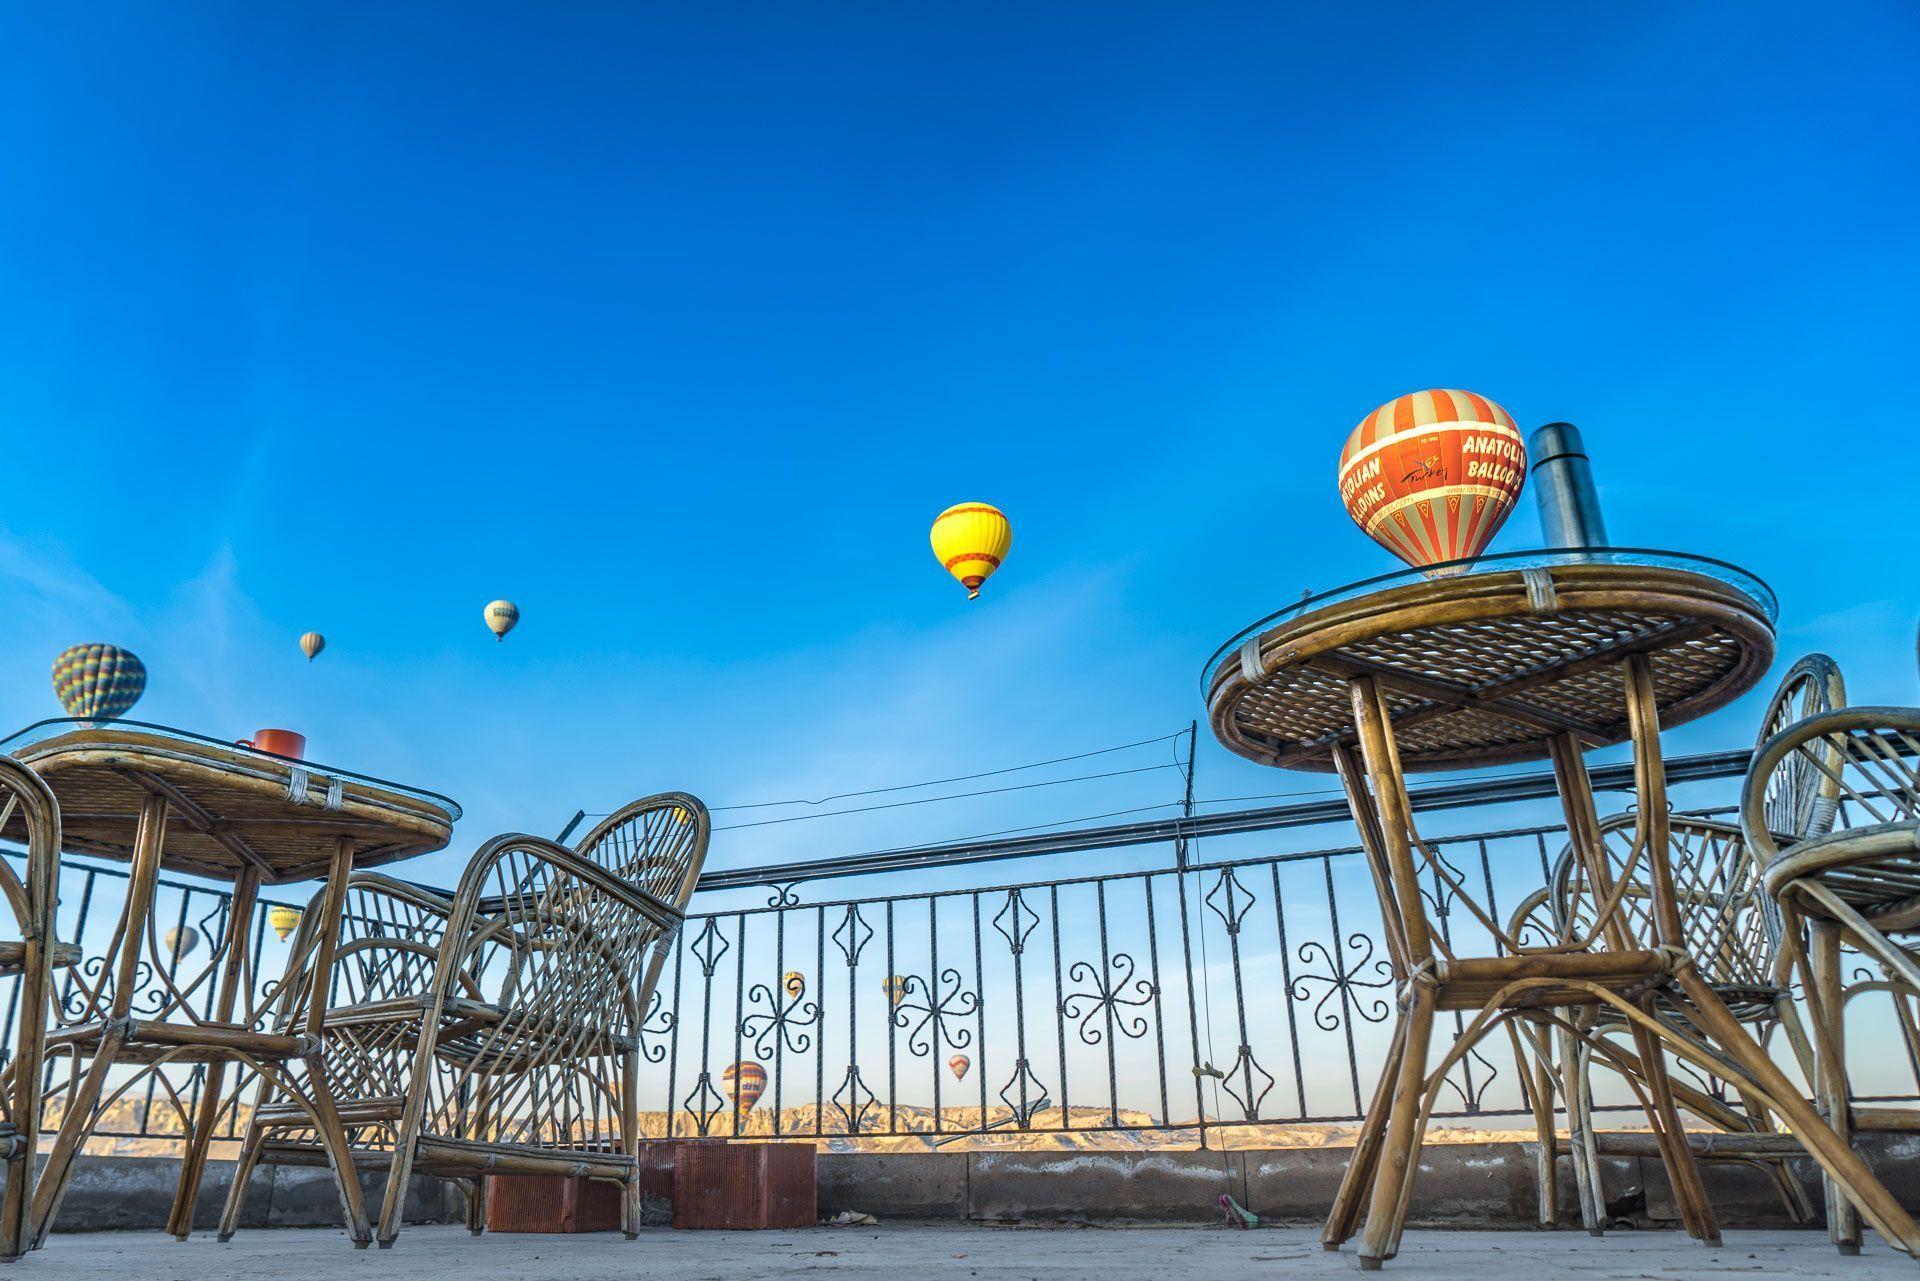 Lesvoyageuses-voyage-en-turquie-itineraire-cappadoce-11